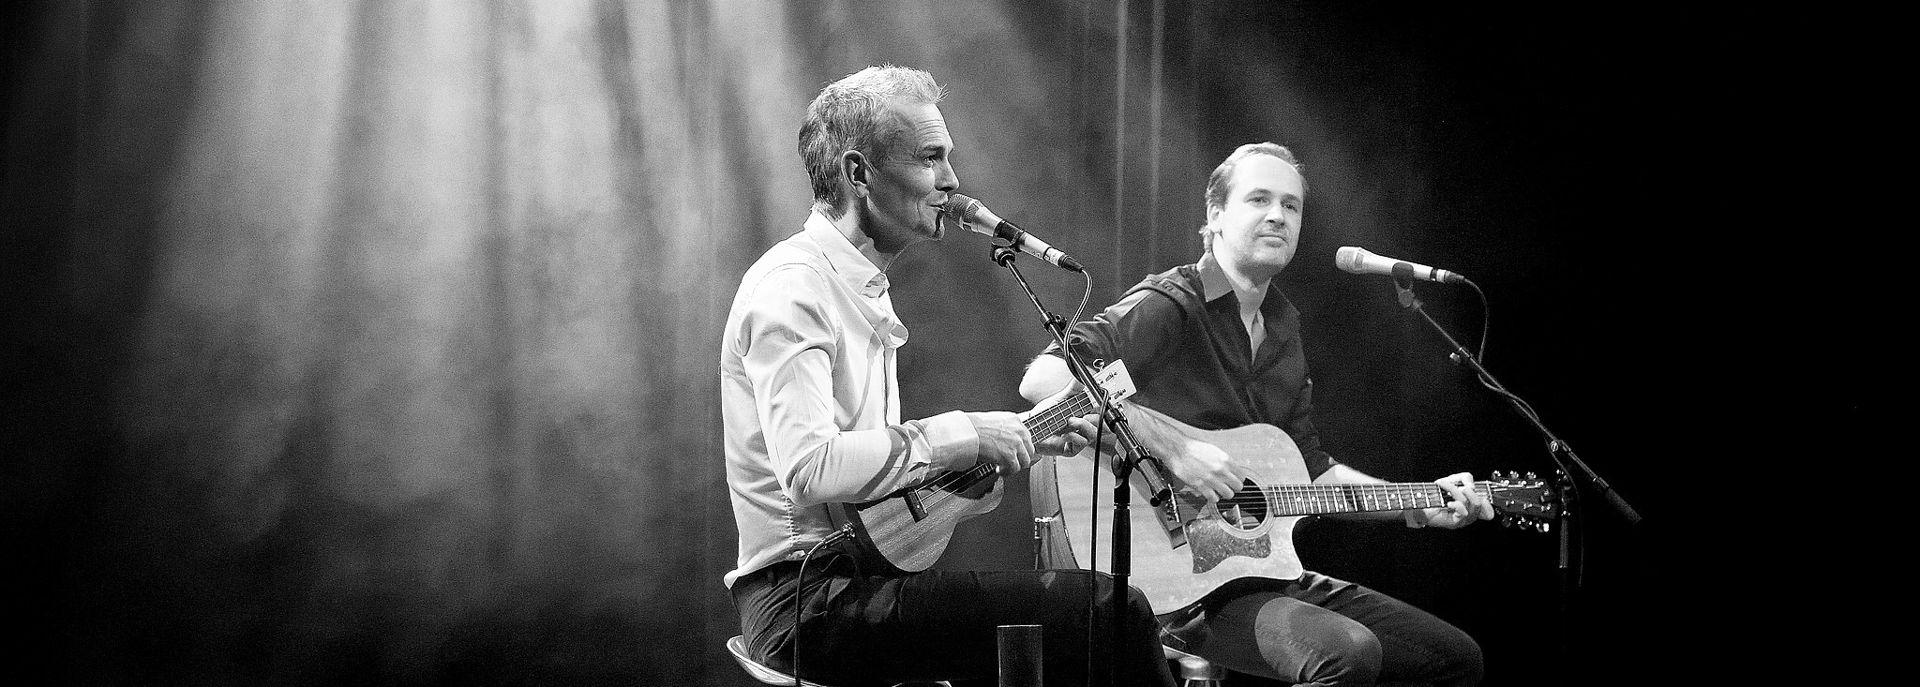 Simon & Garfunkel acoustic